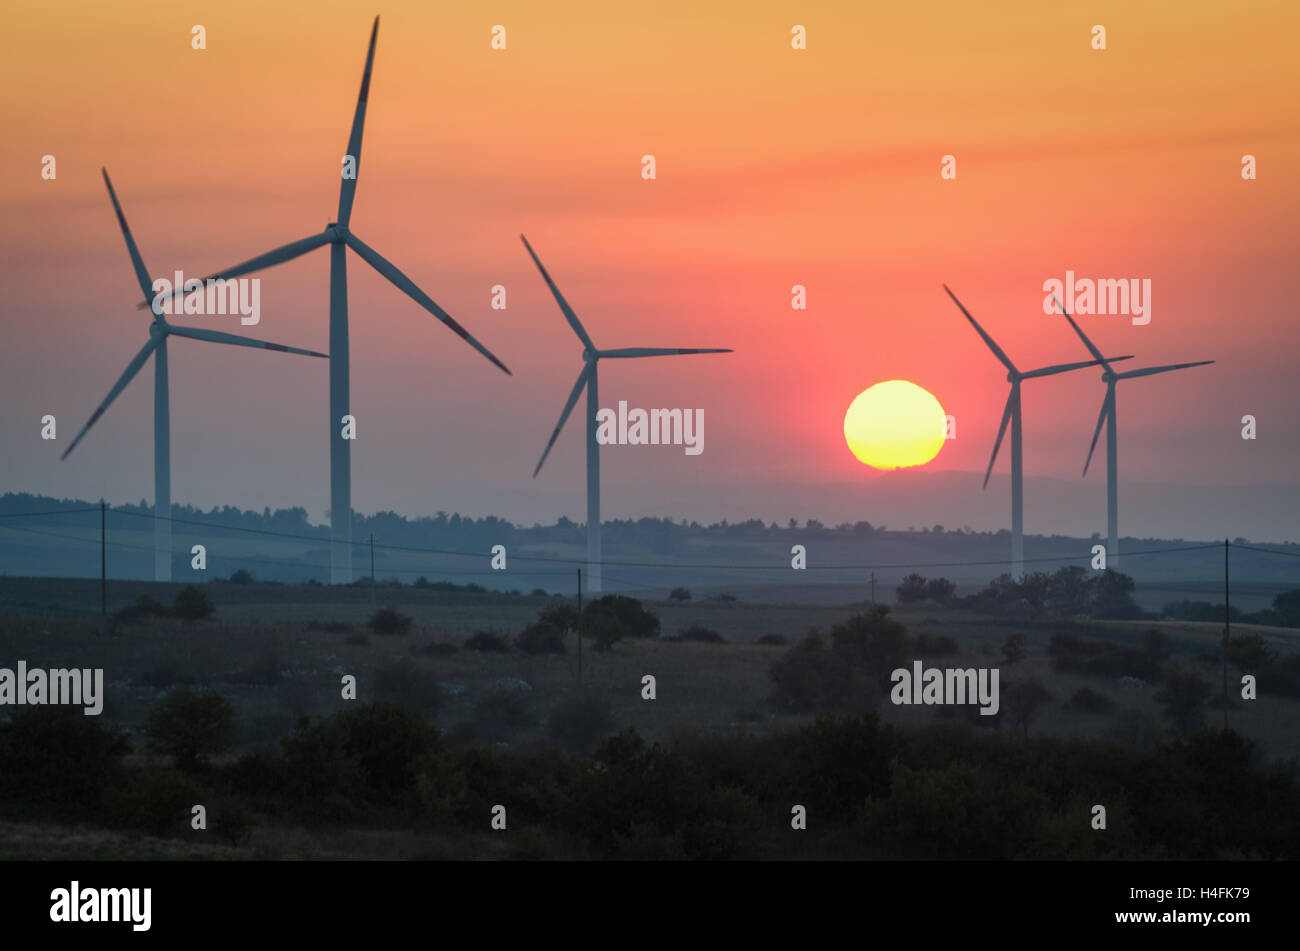 Las turbinas eólicas en Sunset - Concepto de energía renovable Imagen De Stock